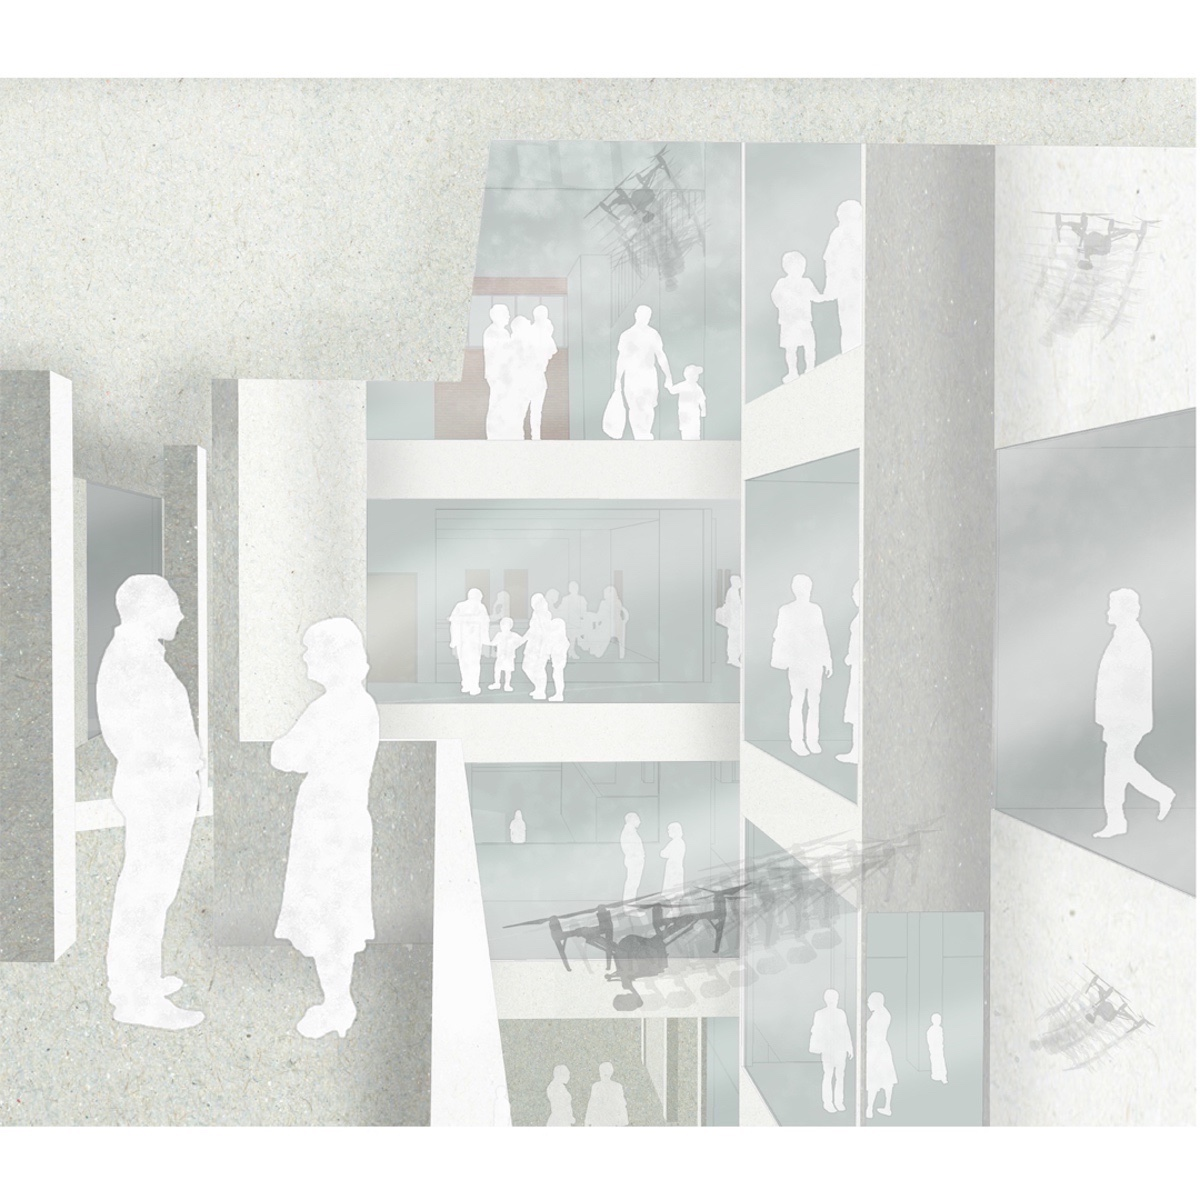 grace gordon's Work Image 7